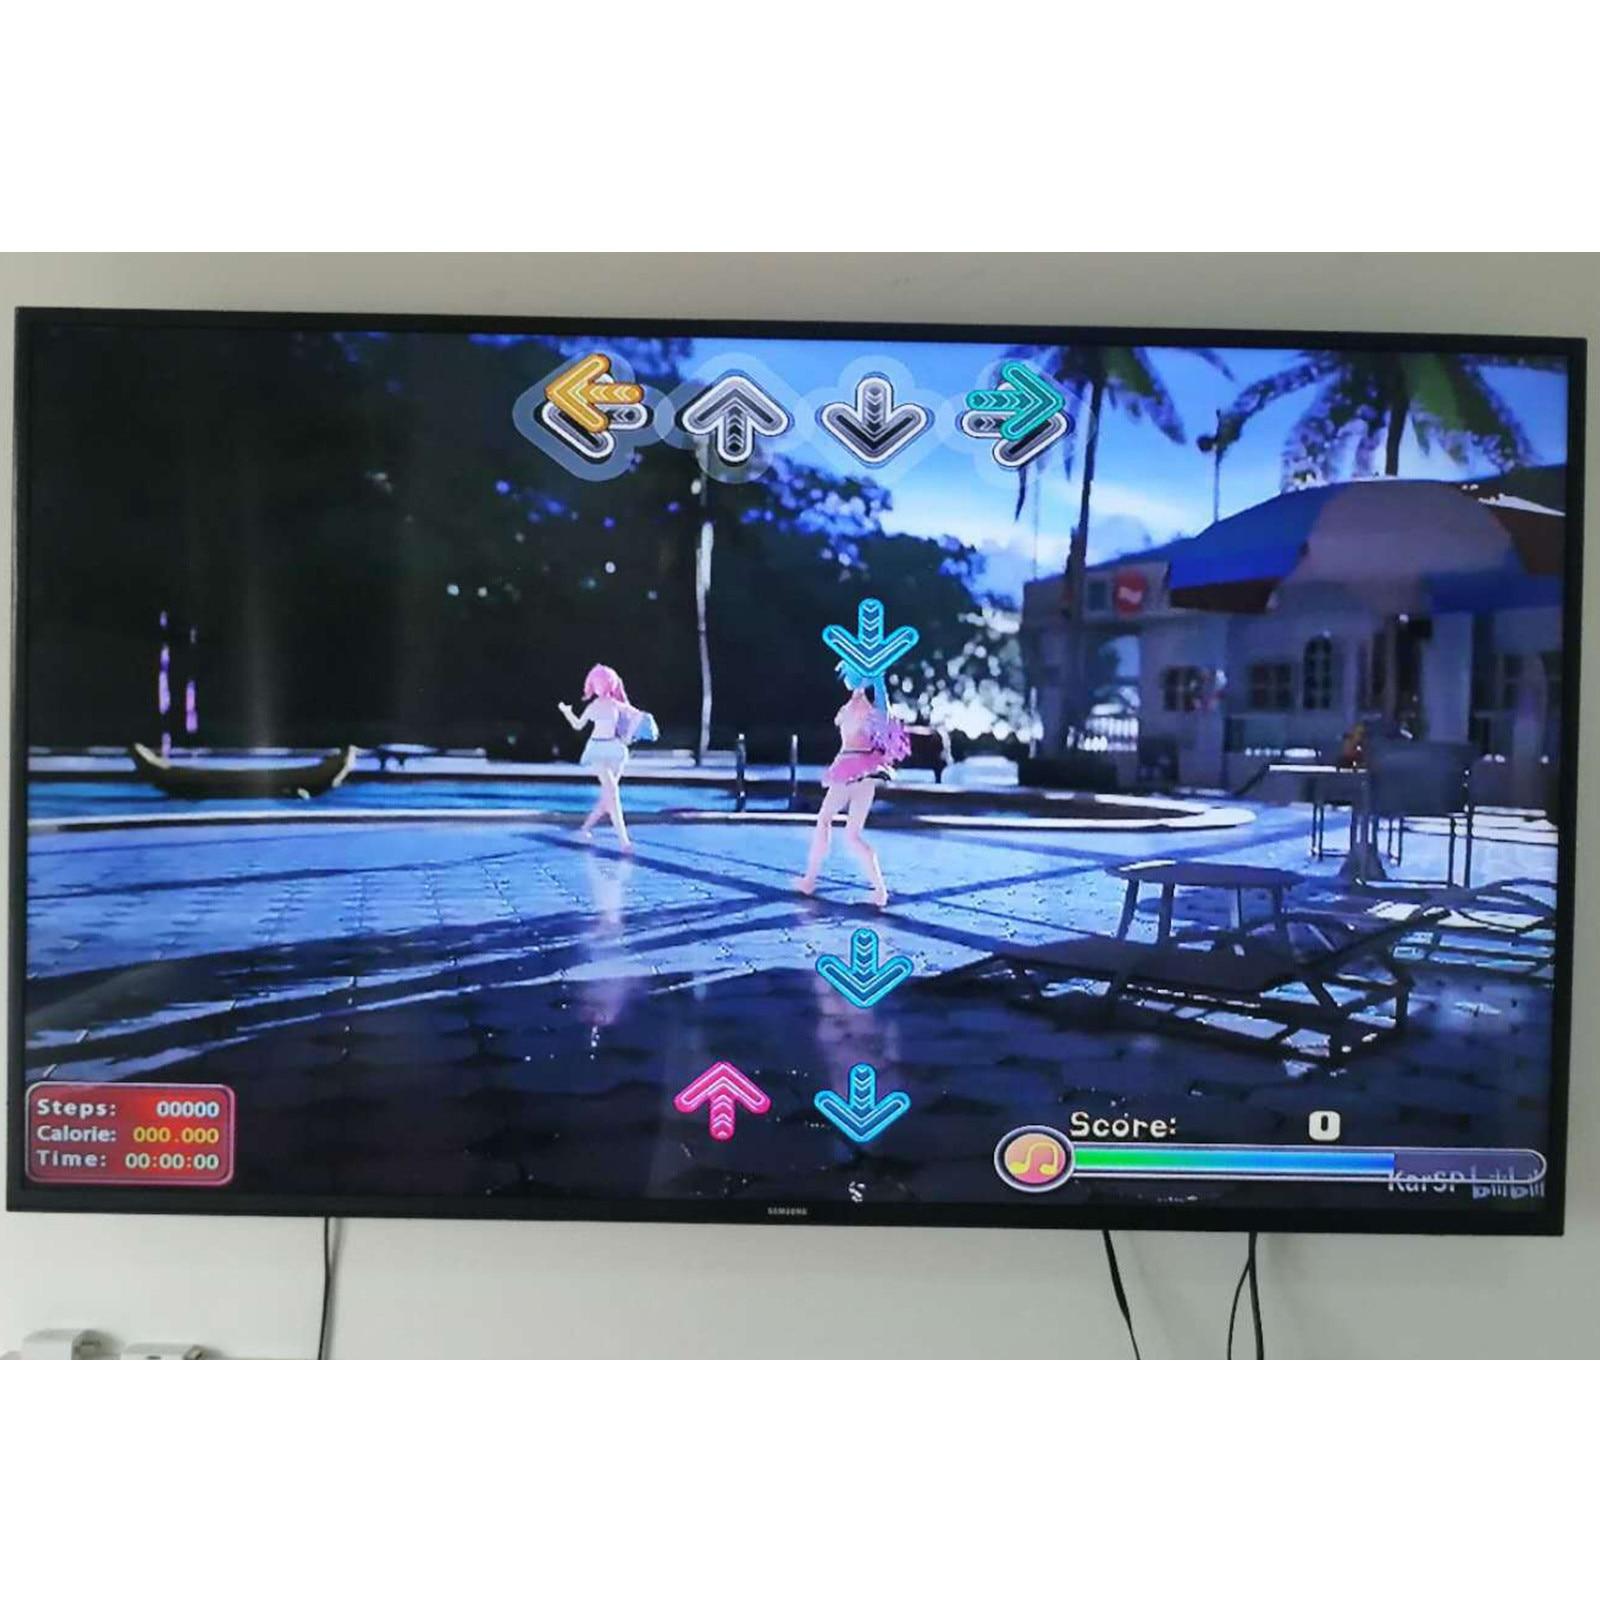 Single User Dance Mats Non-Slip Dancers Step yoga Pads Sense Game for PC Children Kids Doll Toys Girls Boys Birthday Gifts-2